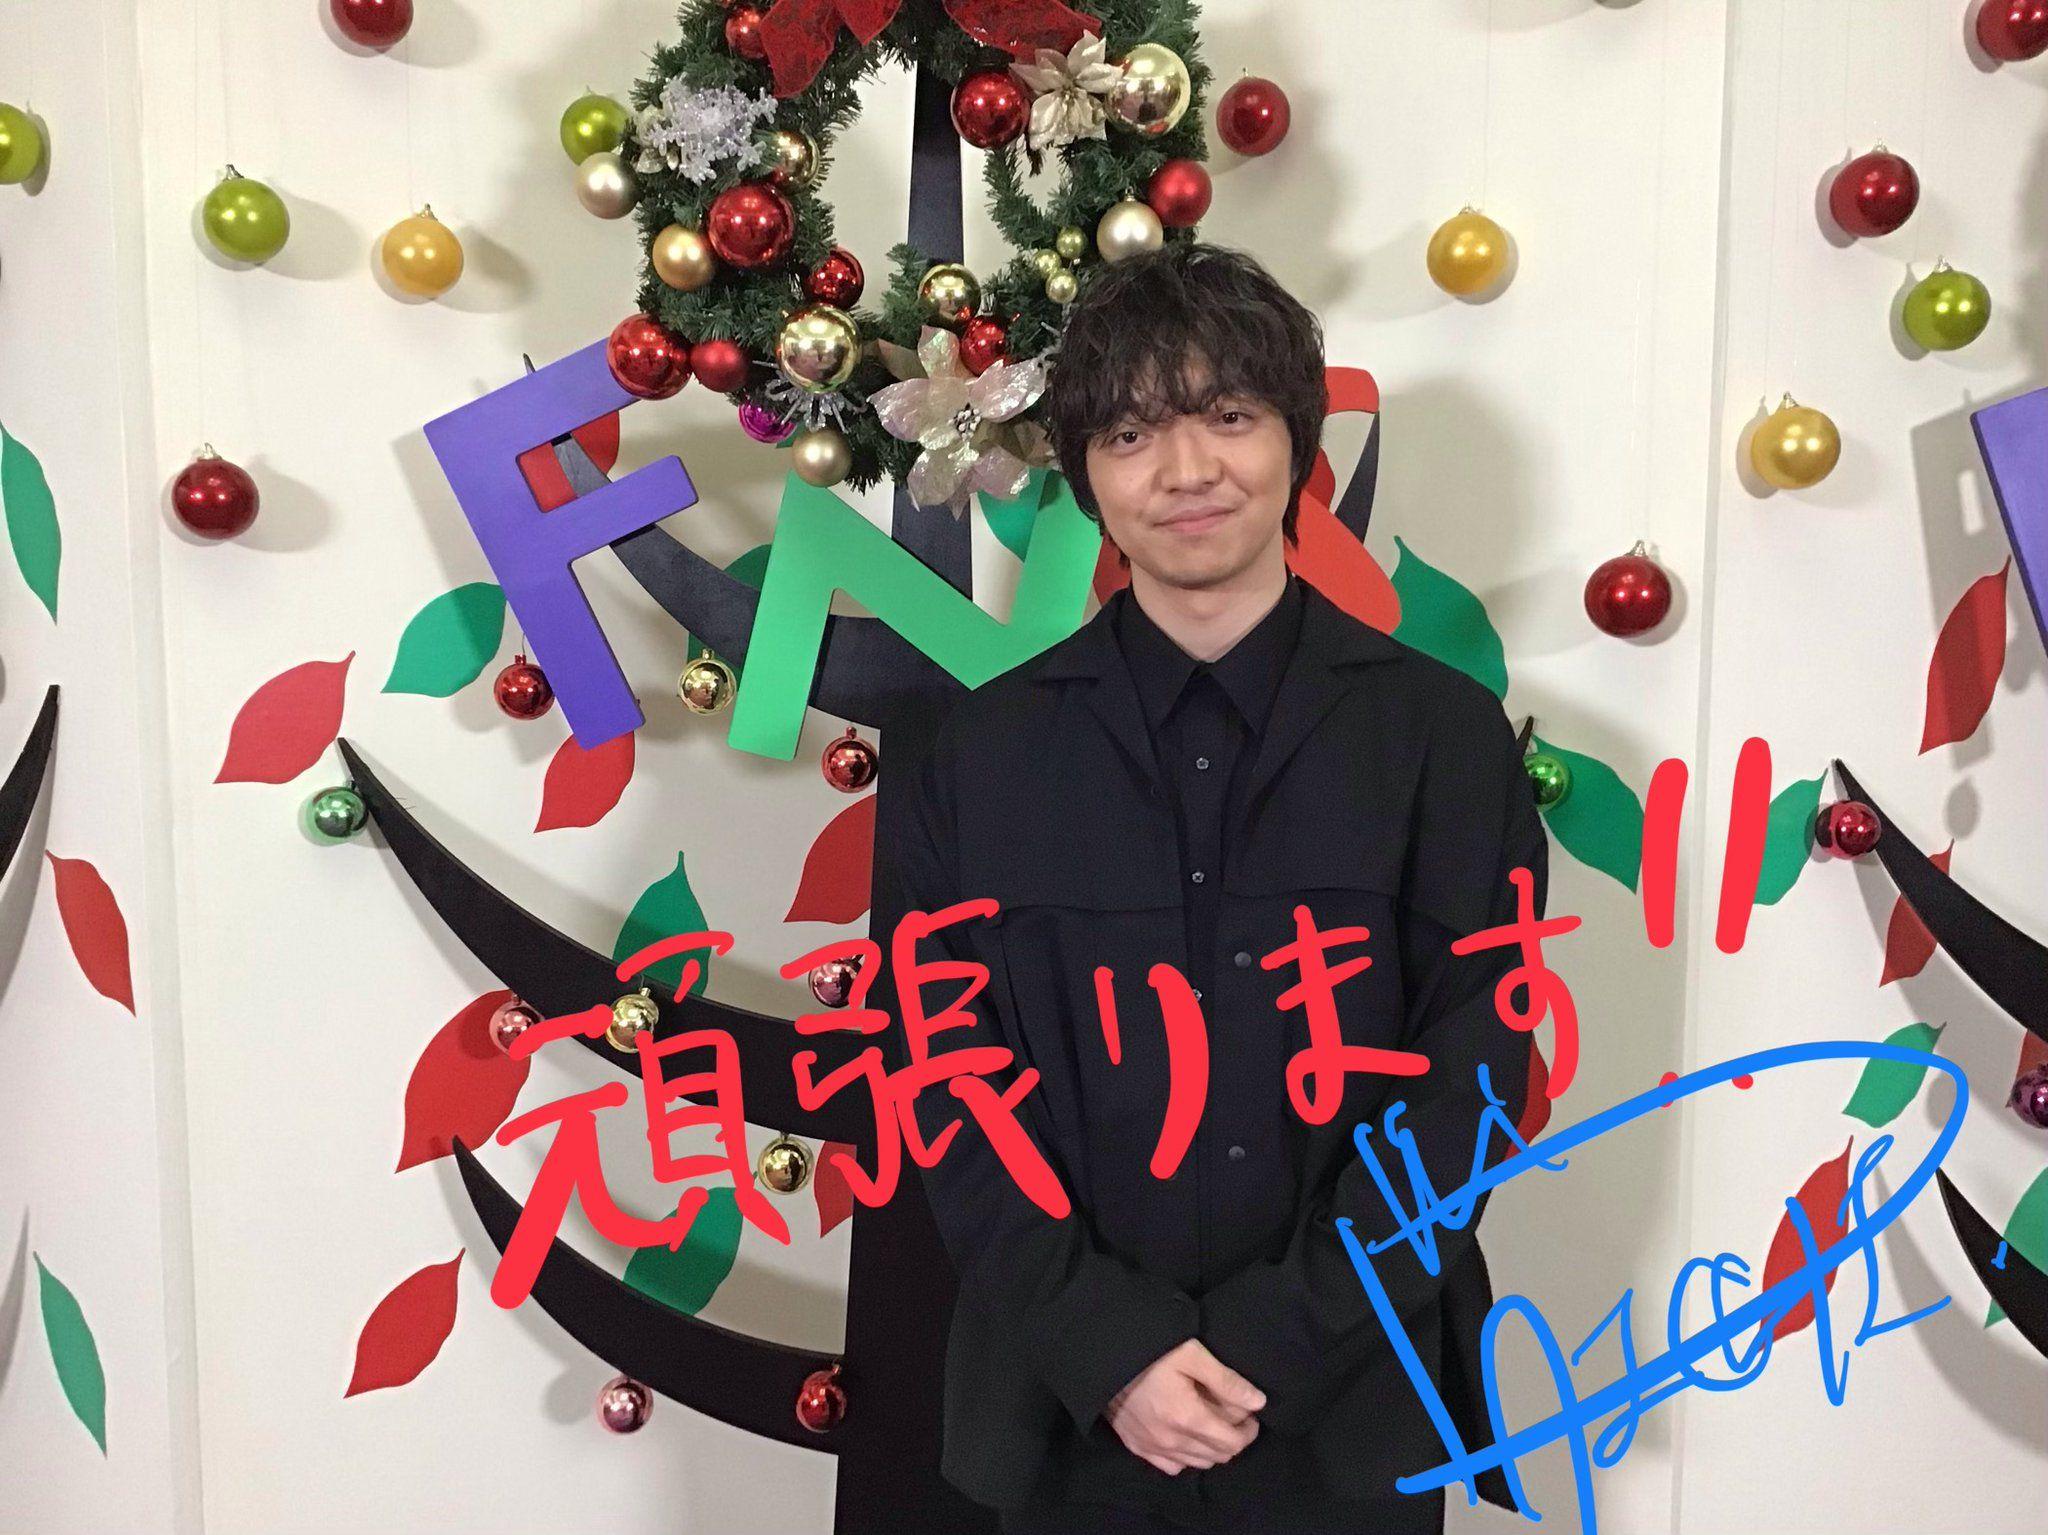 2019 Fns歌謡祭 公式 On 2020 三浦大知 祭 三浦